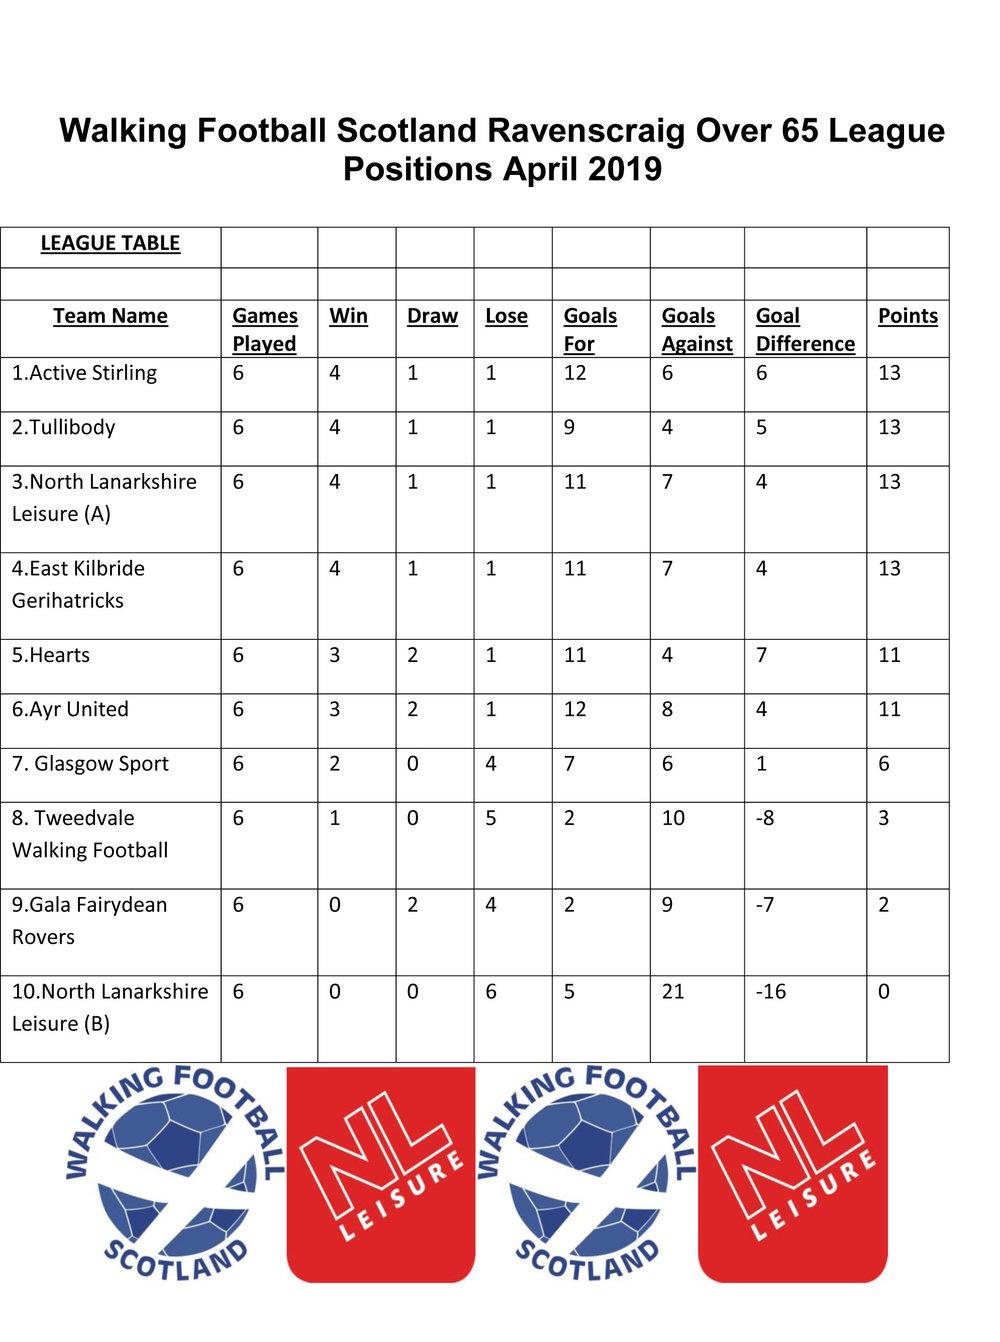 Walking Football Scotland Ravenscraig Over 65 League Positions April 2019.jpg